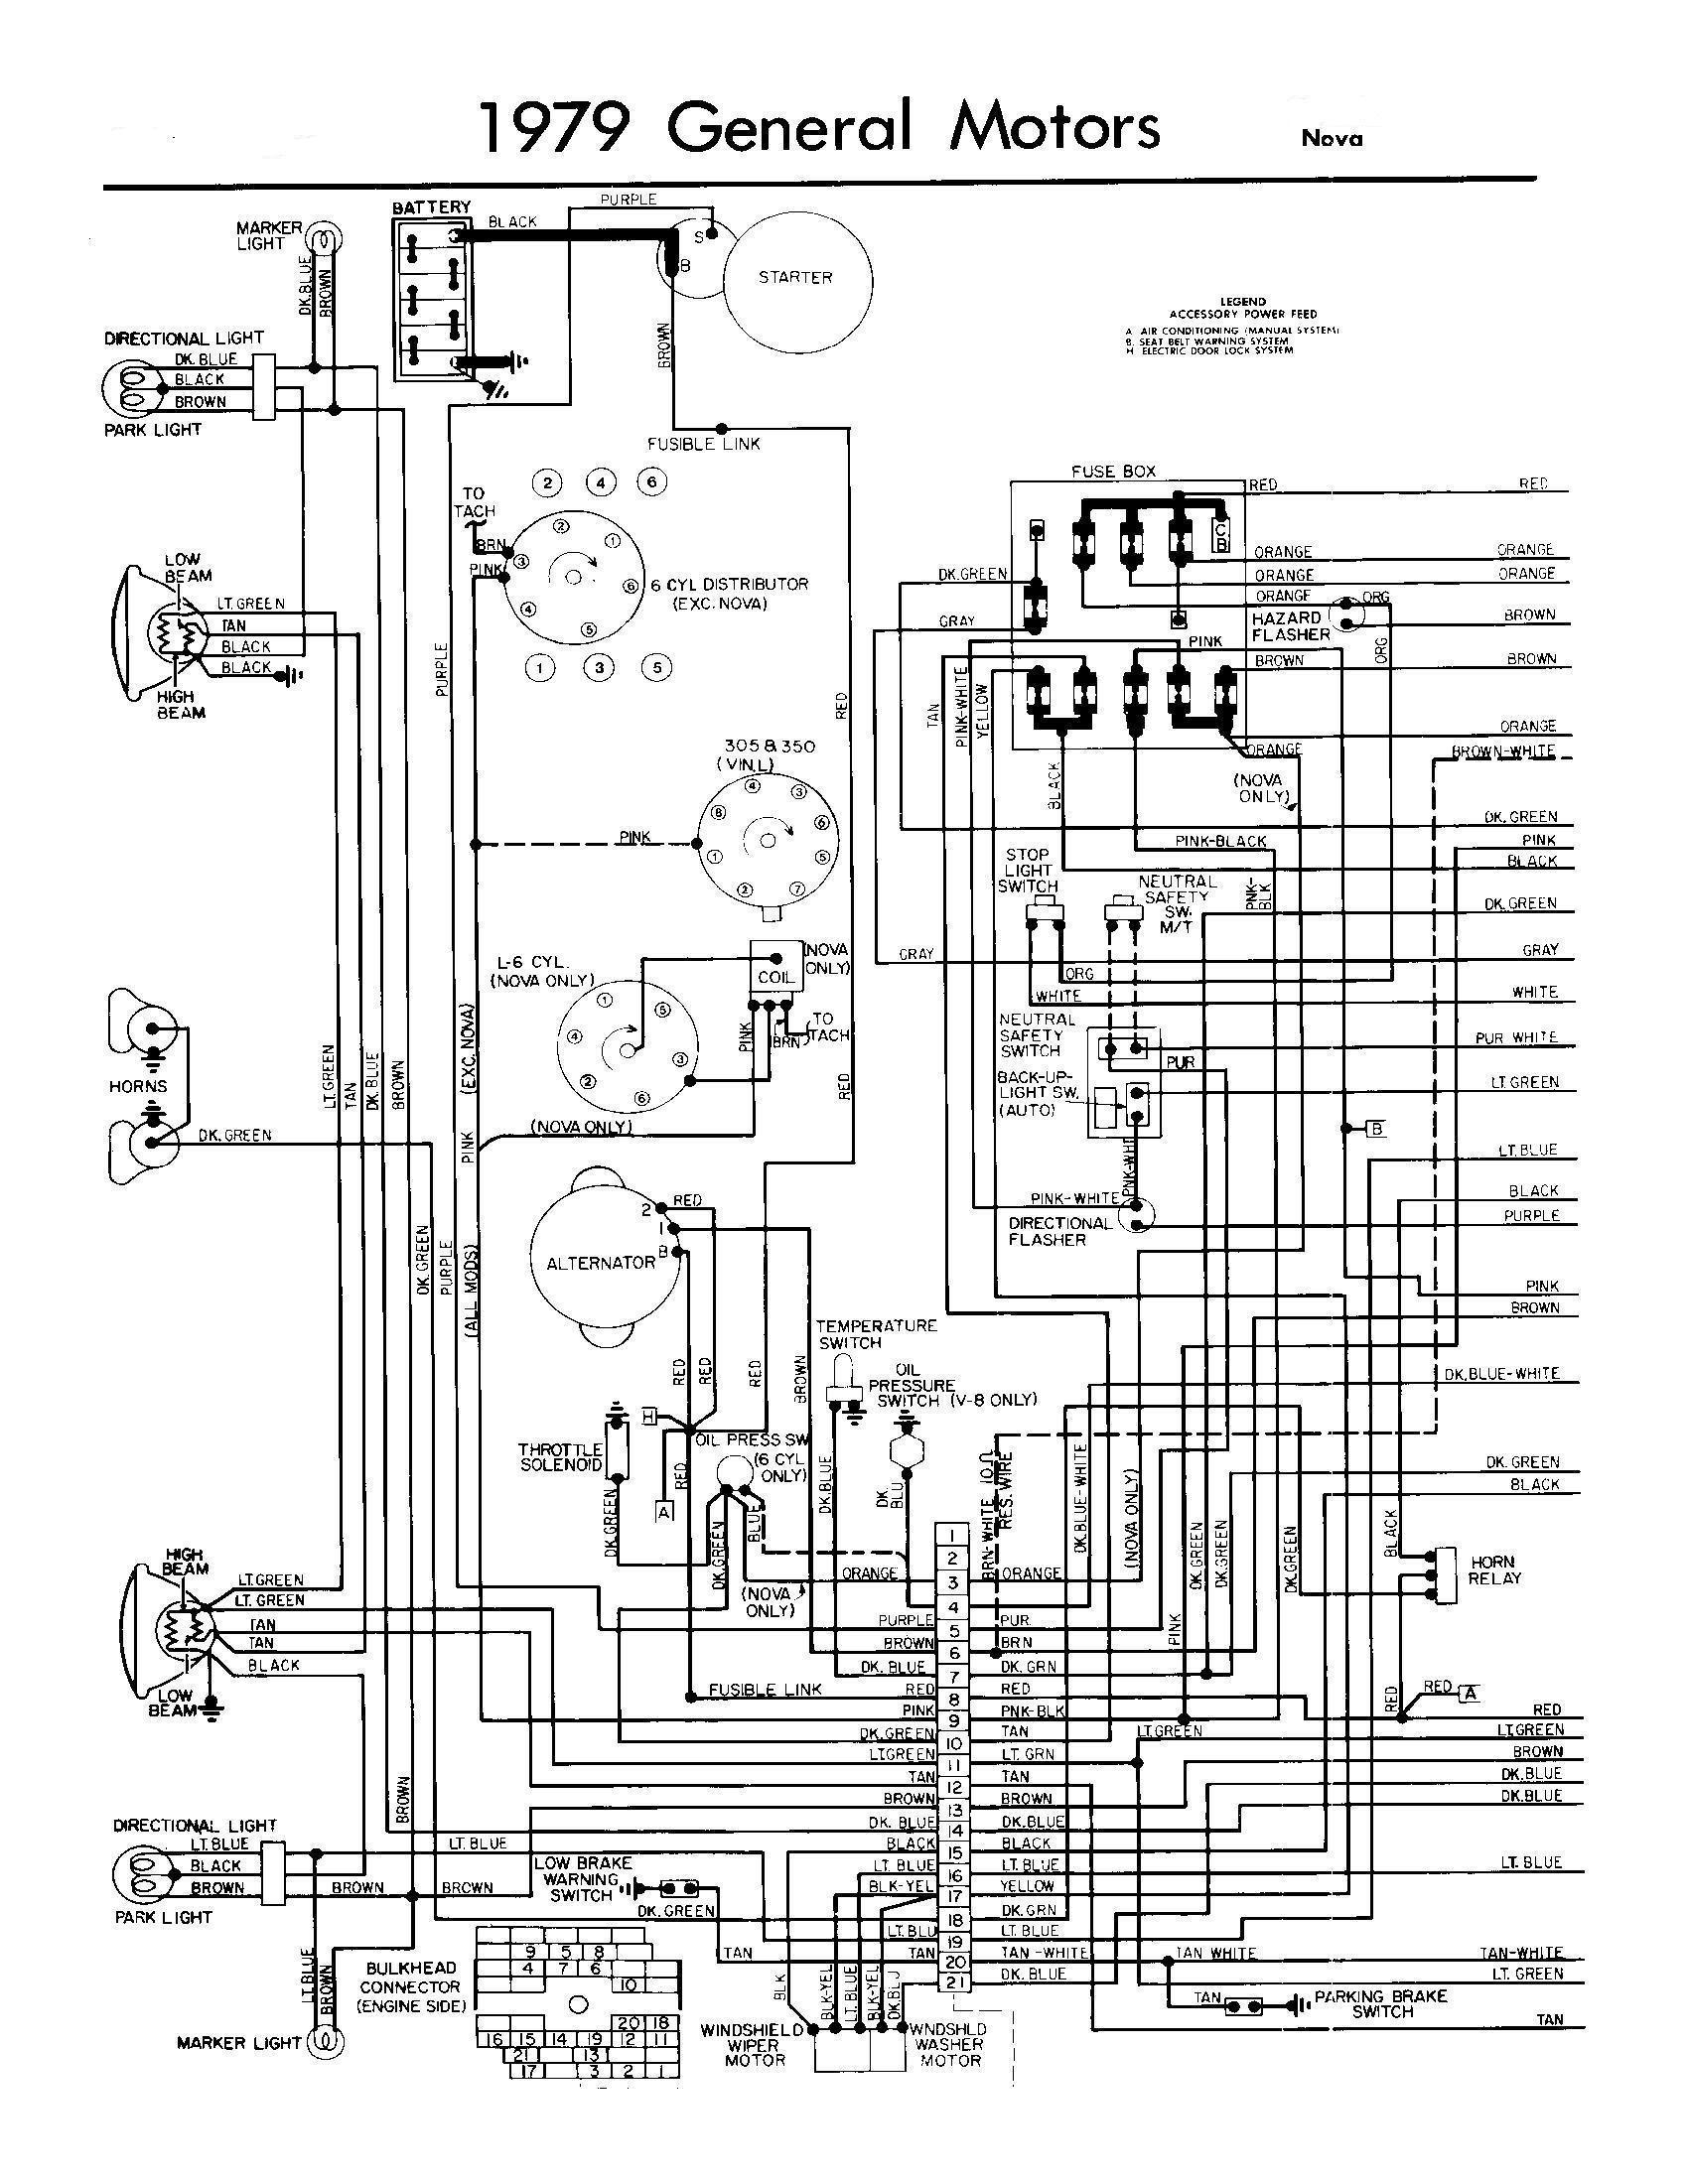 1979 Corvette Wiring Diagram All Generation Wiring Schematics Chevy Nova  forum Of 1979 Corvette Wiring Diagram